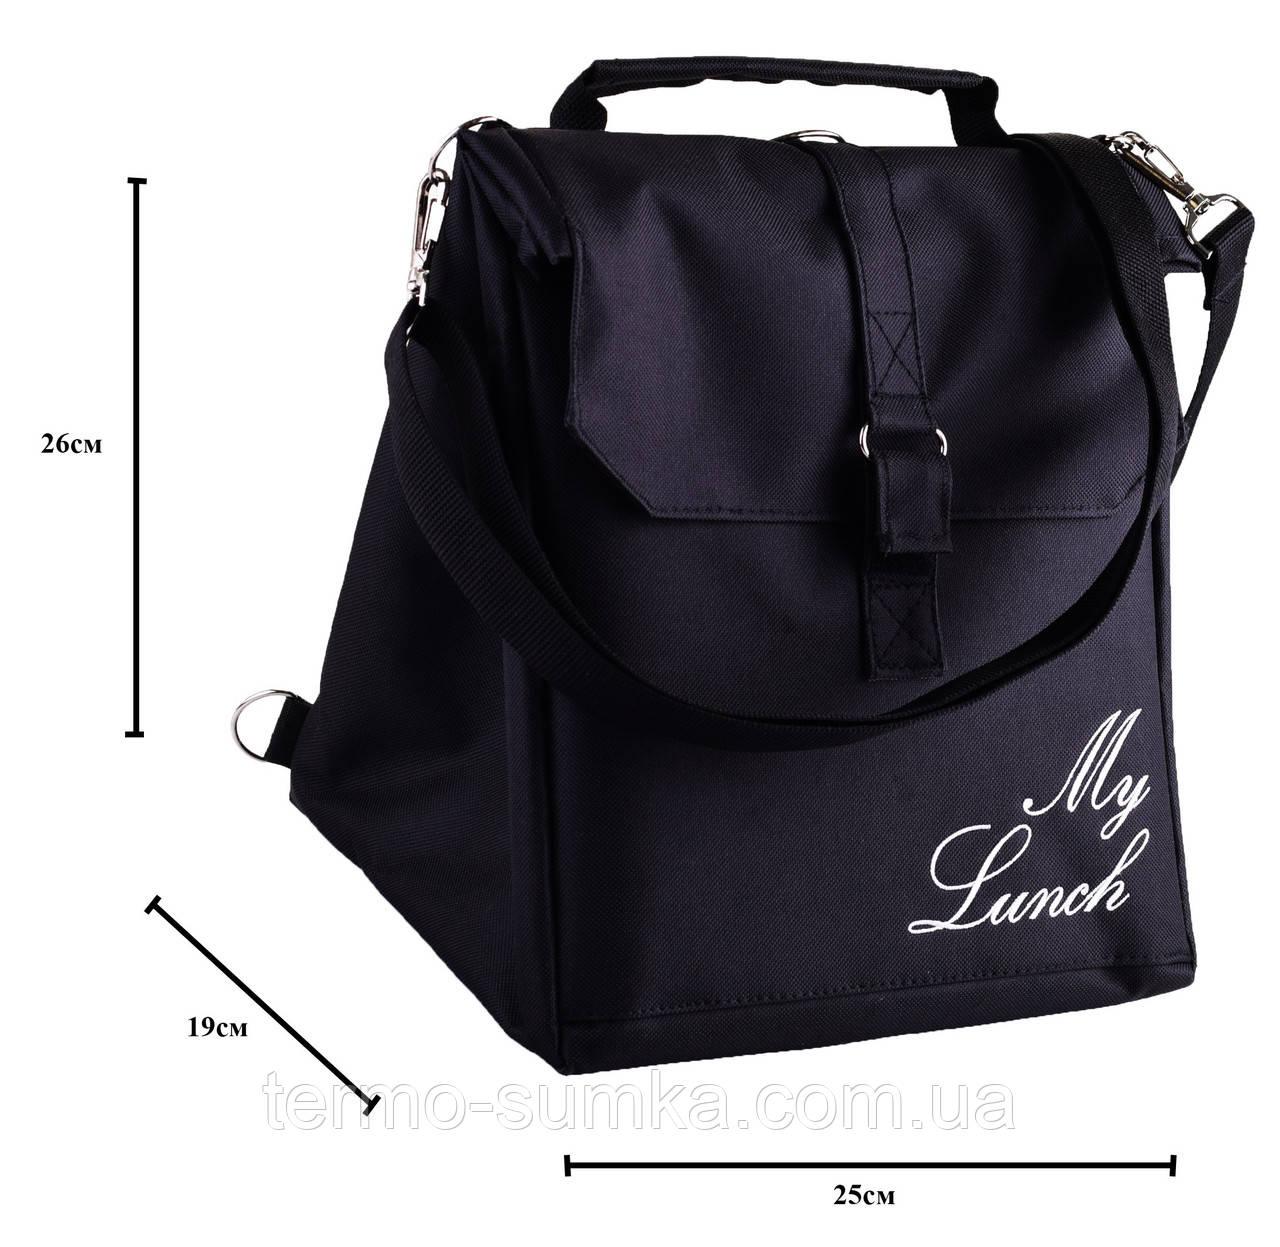 Ланч бег, термосумка - рюкзак. Lunch bag Dolphin з вишивкою My lunch. Чорний